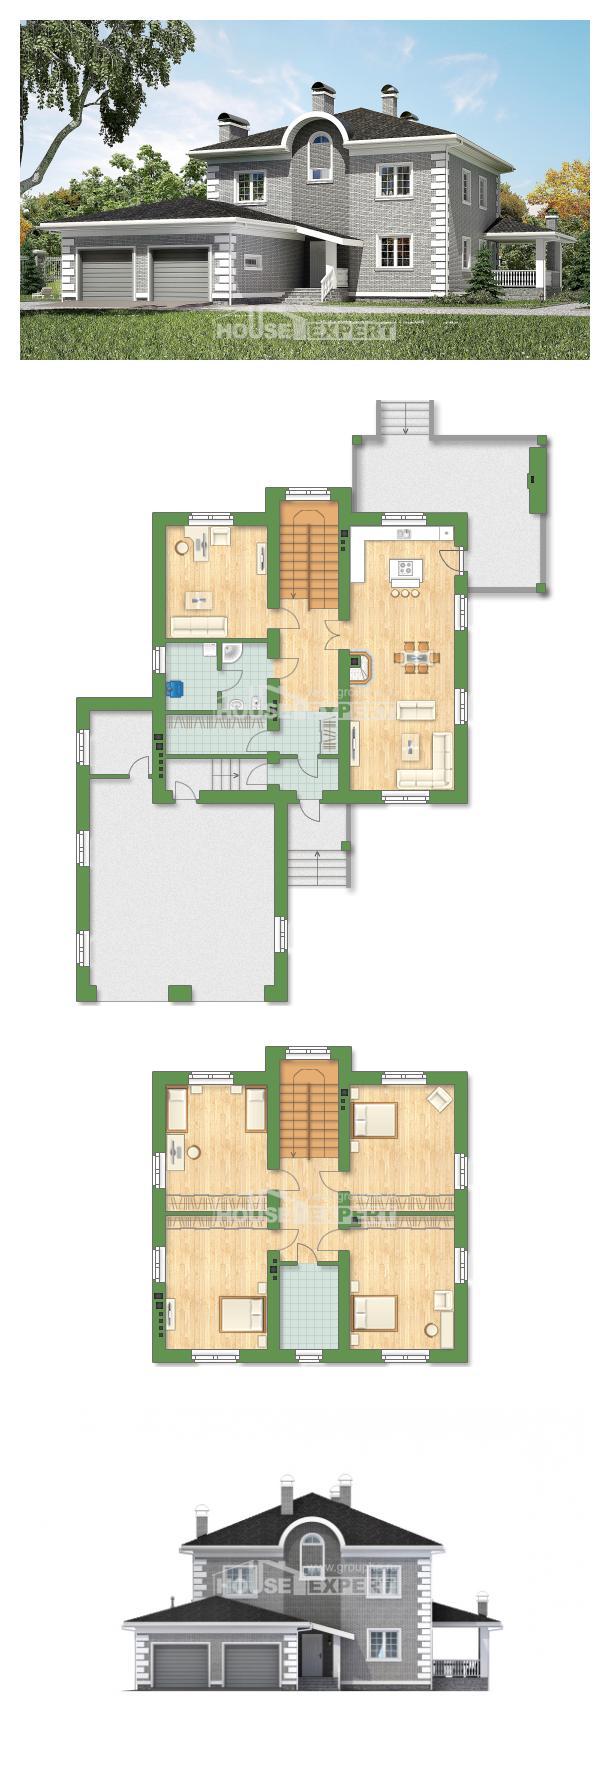 Проект дома 245-004-Л   House Expert